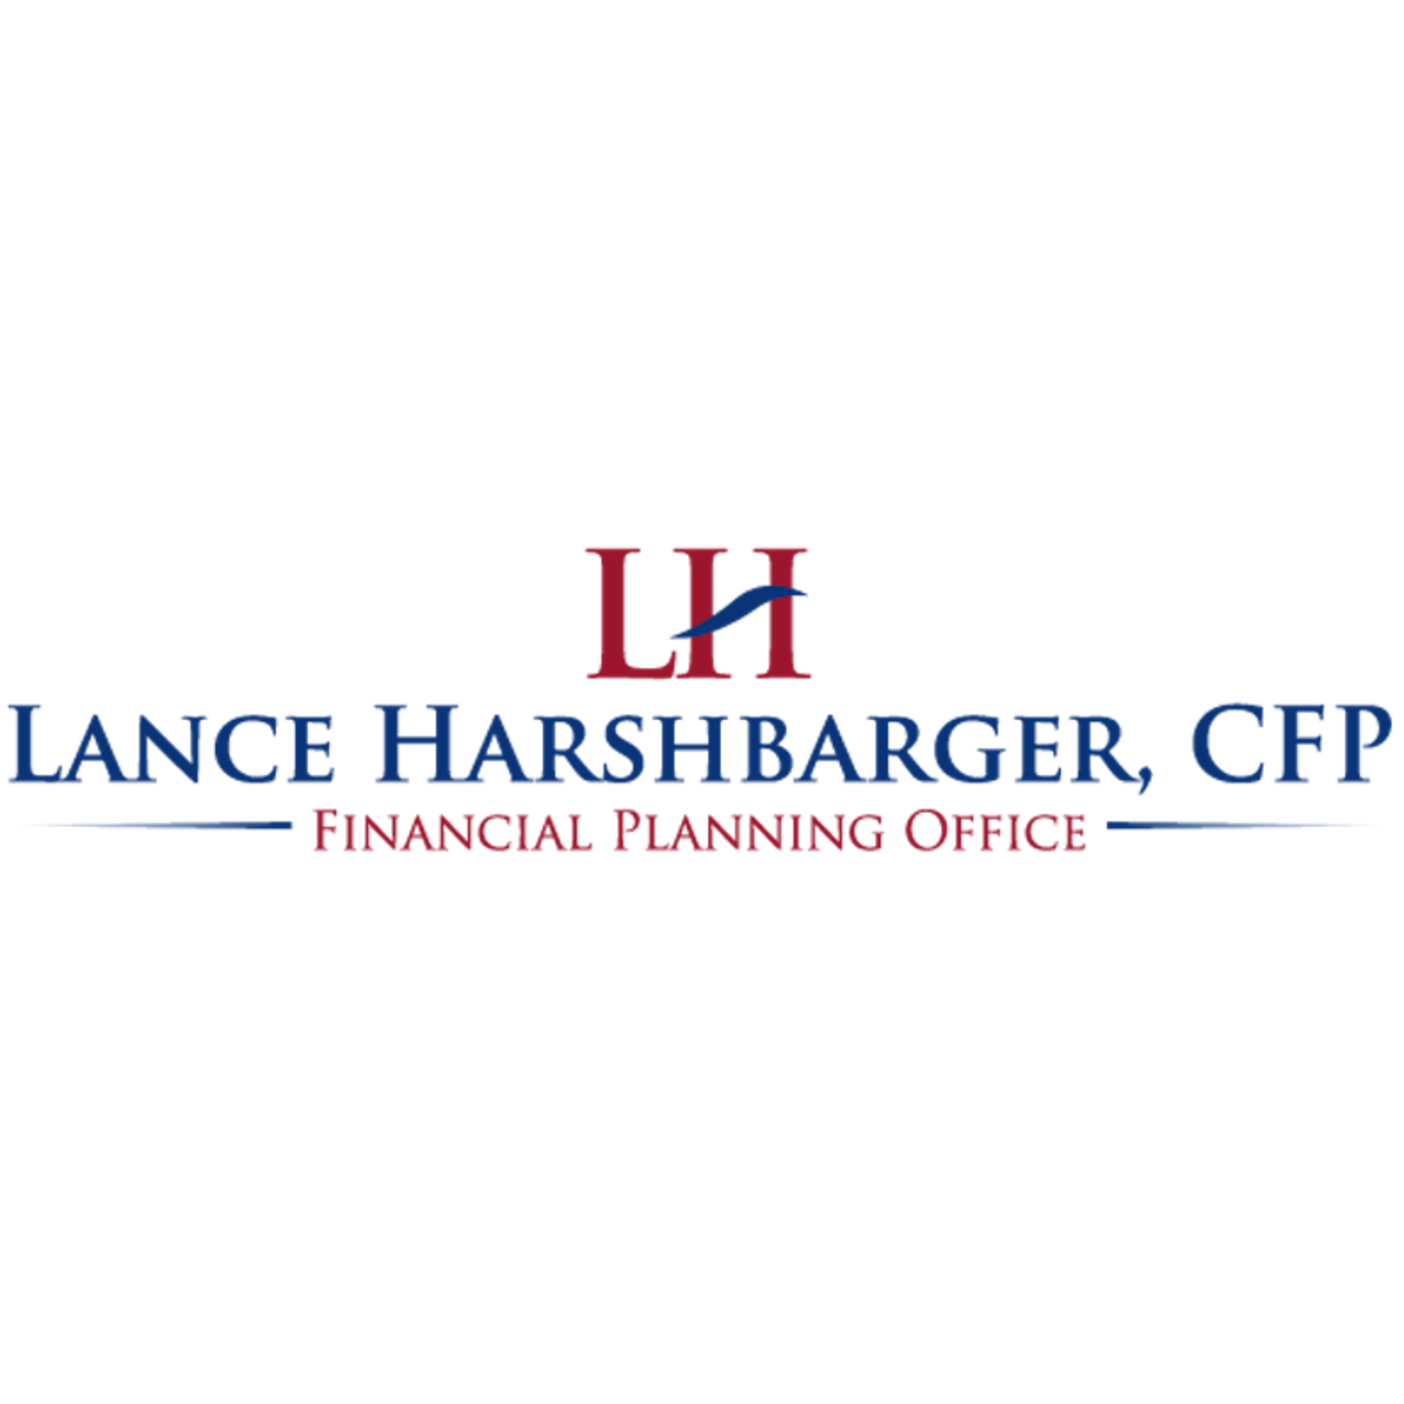 Lance Harshbarger, CFP - Securities America, Inc. - Overland Park, KS - Financial Advisors